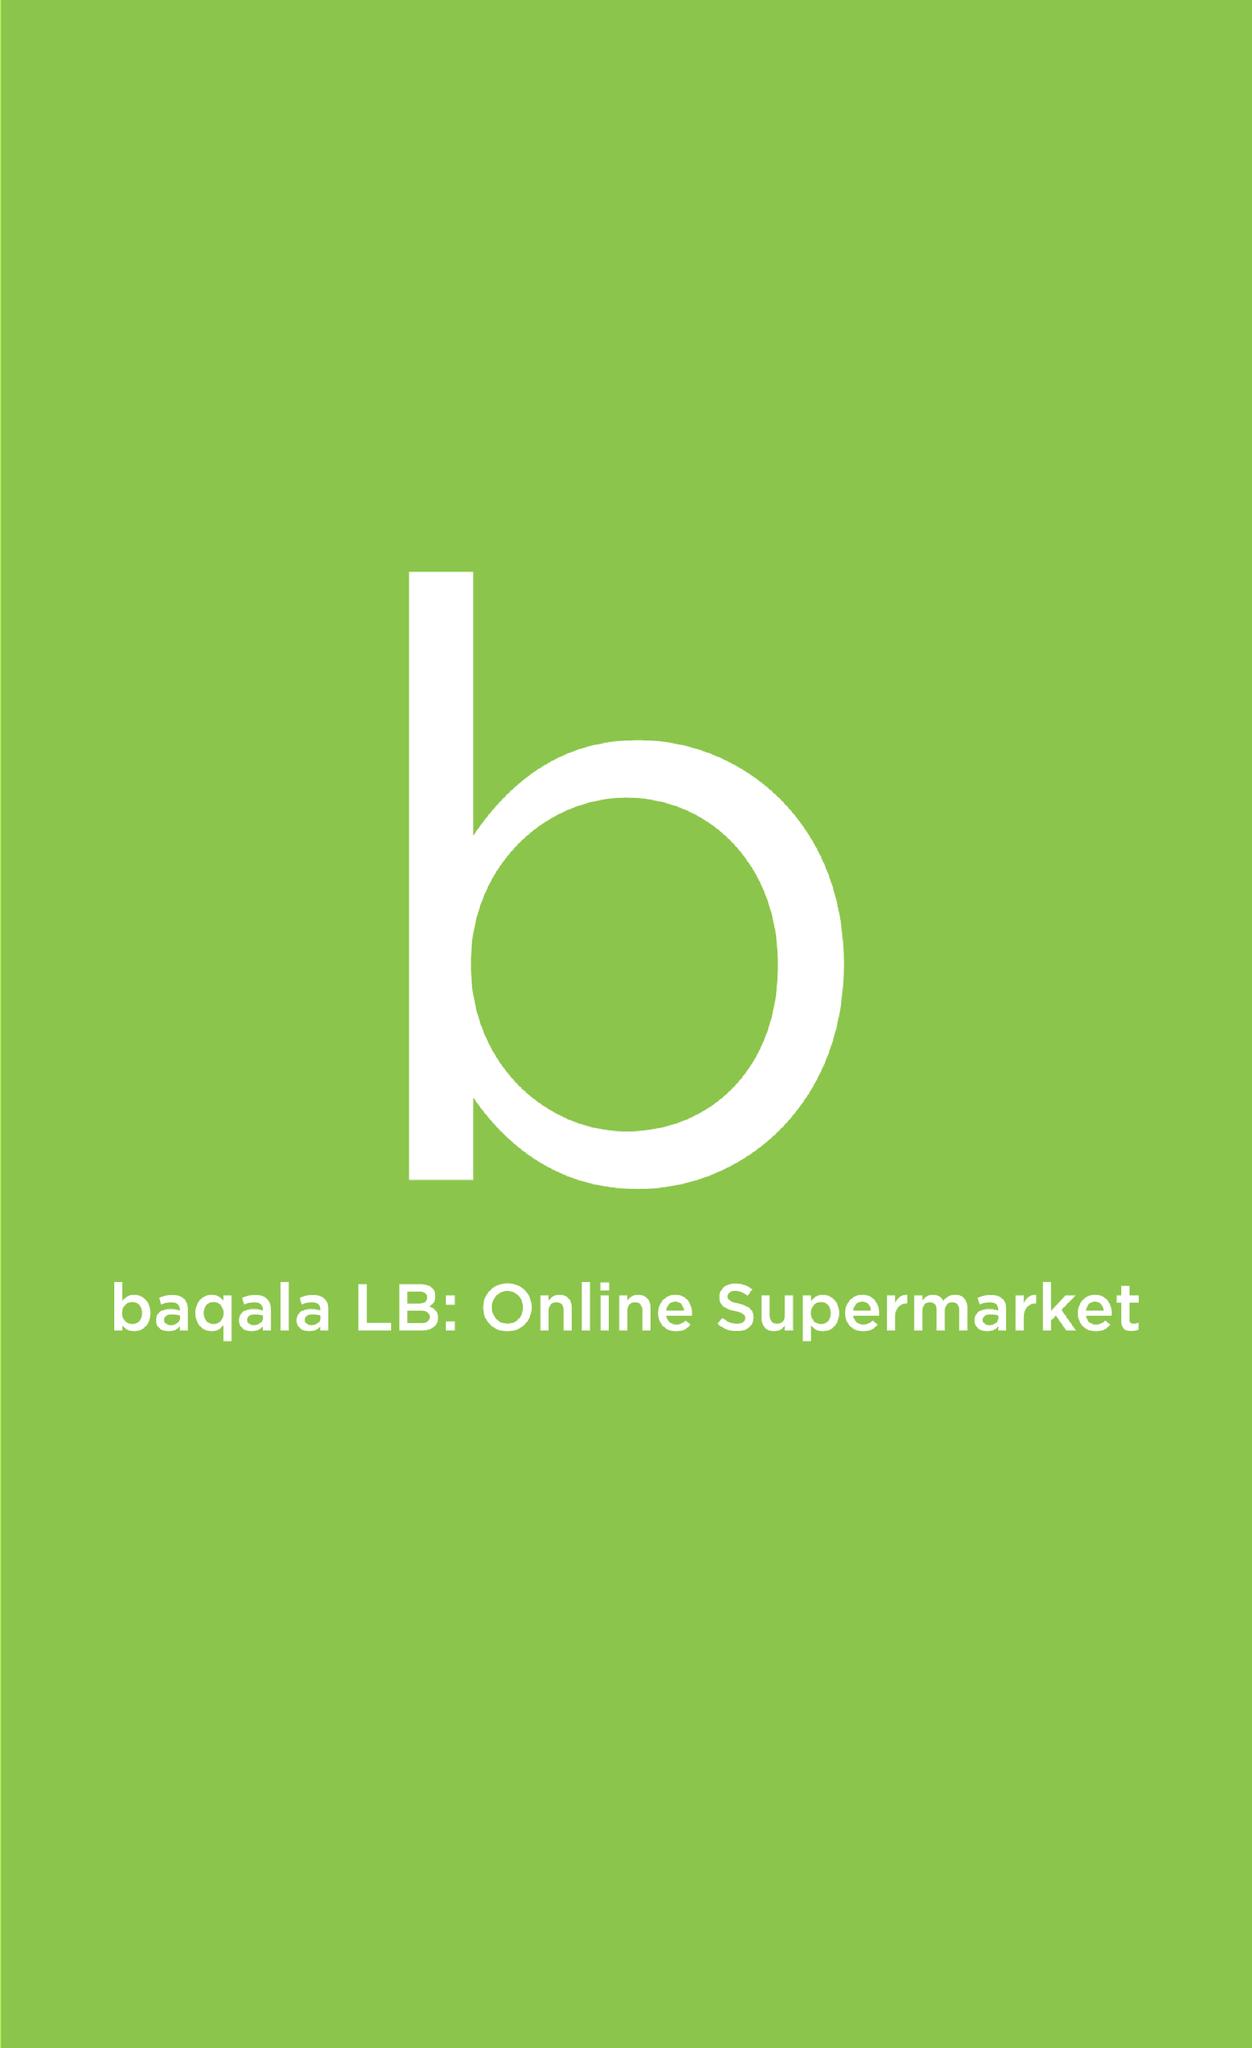 Baqala LB